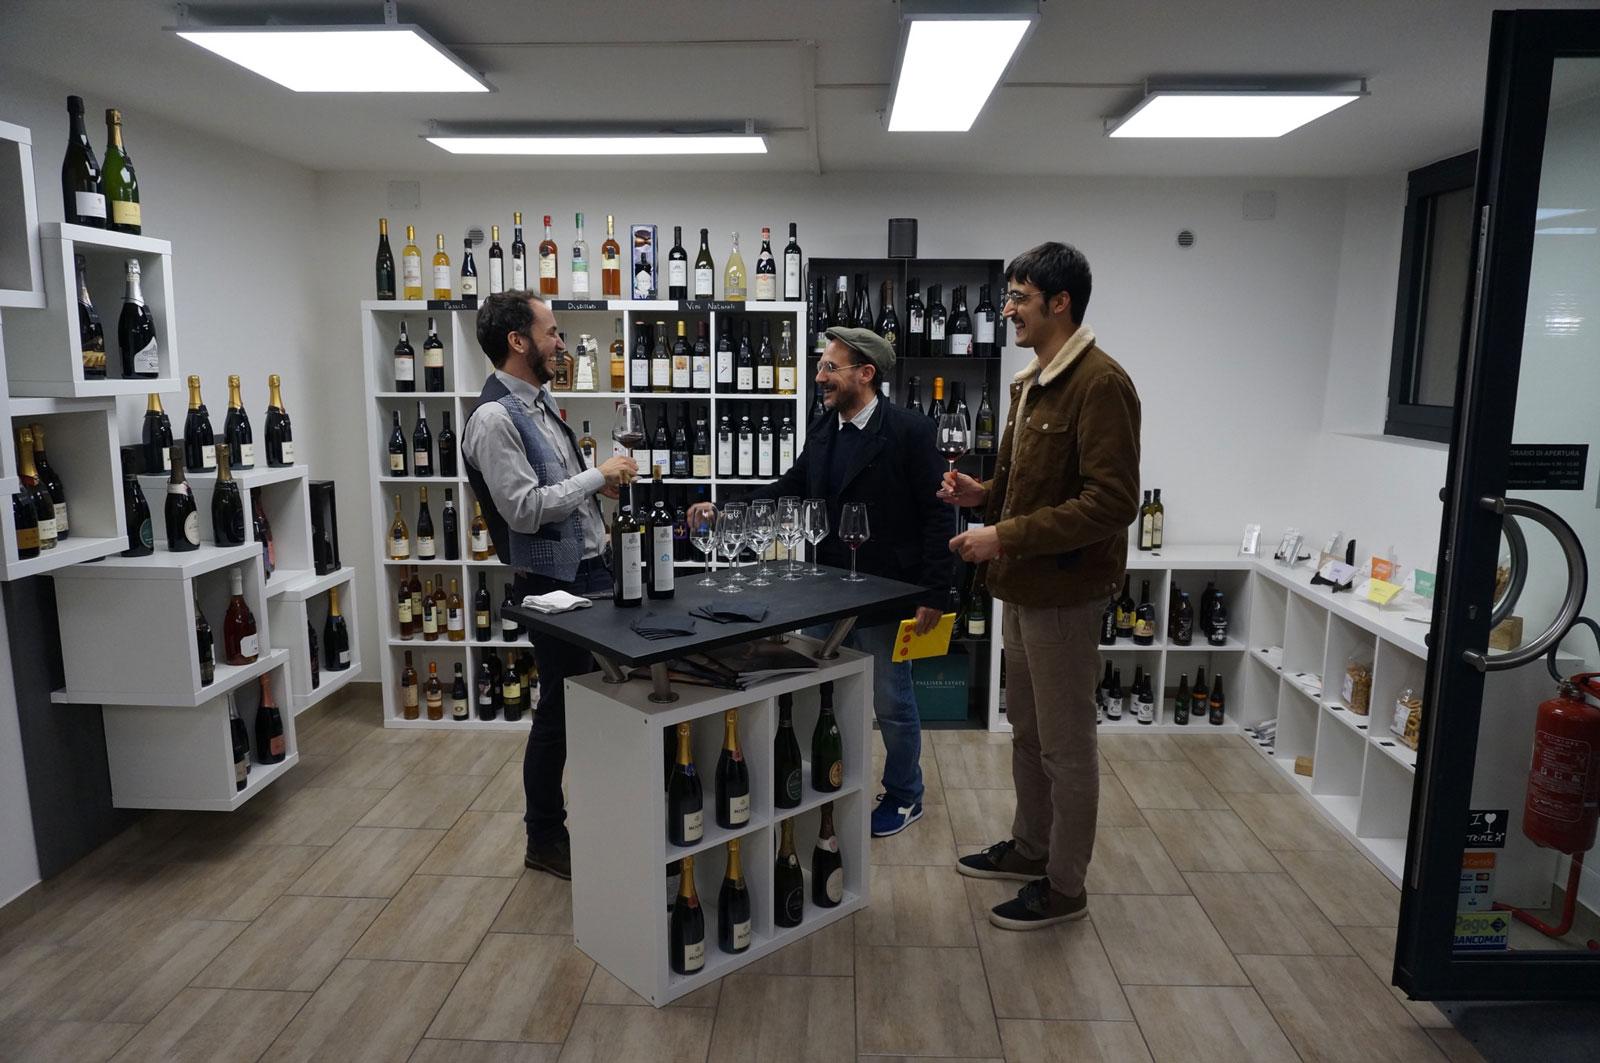 Clientela all'enoteca botrytis durante una degustazione vini